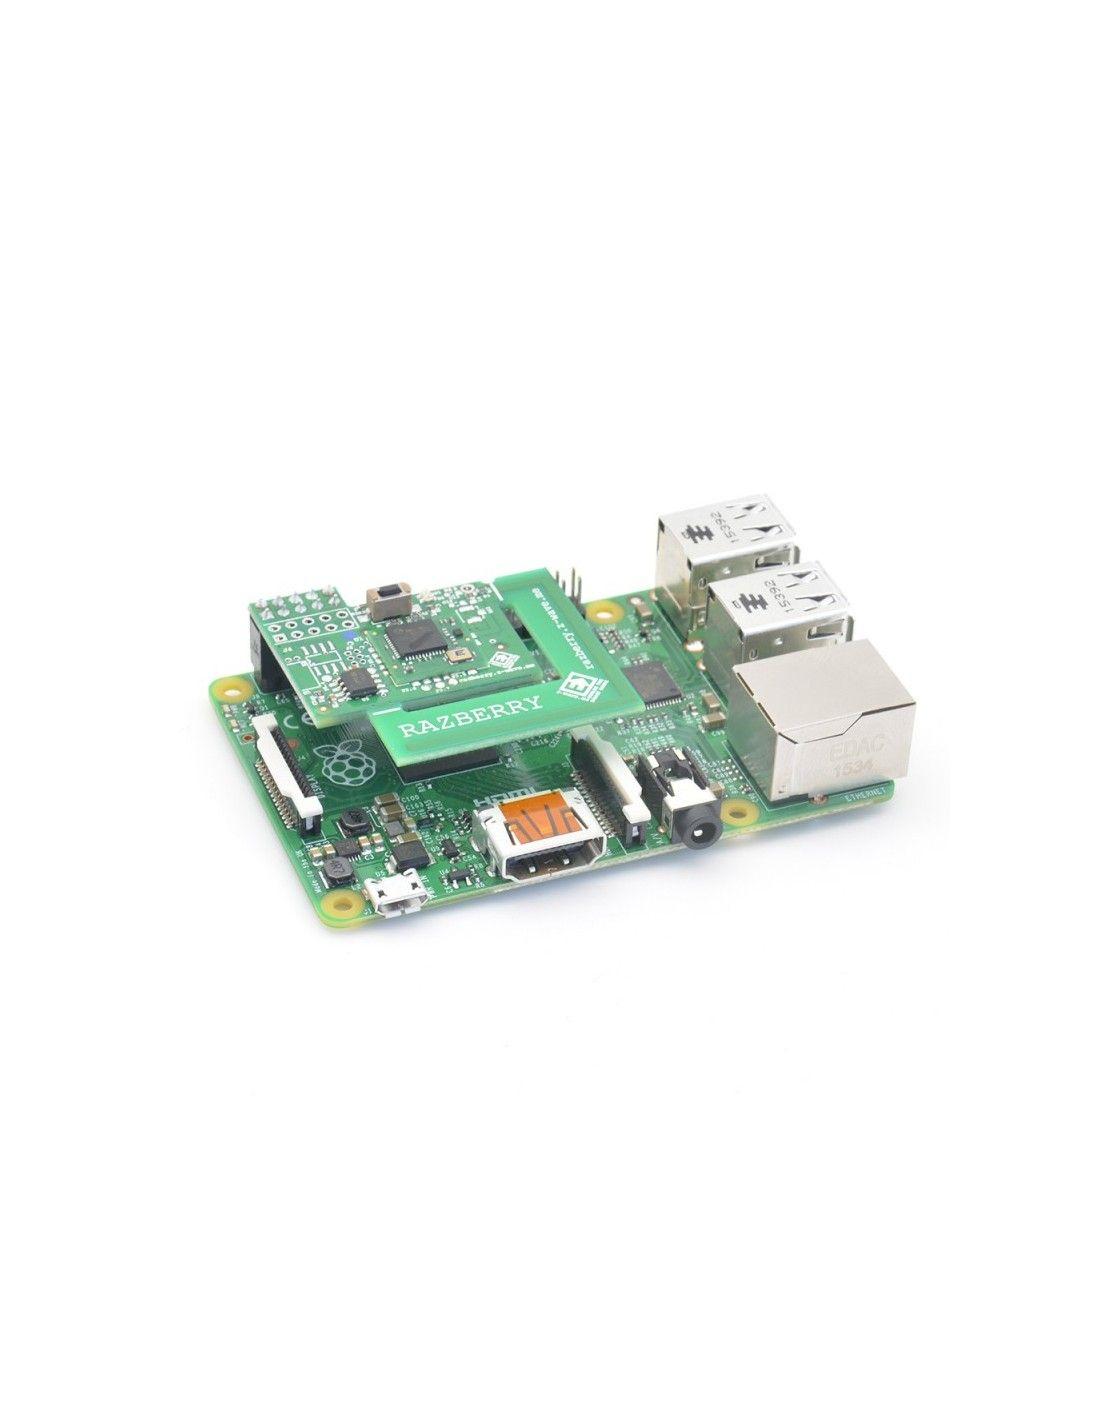 Z-Wave Me - Scheda d'espansione Razberry 2 Z-Wave+ per Raspberry Pi